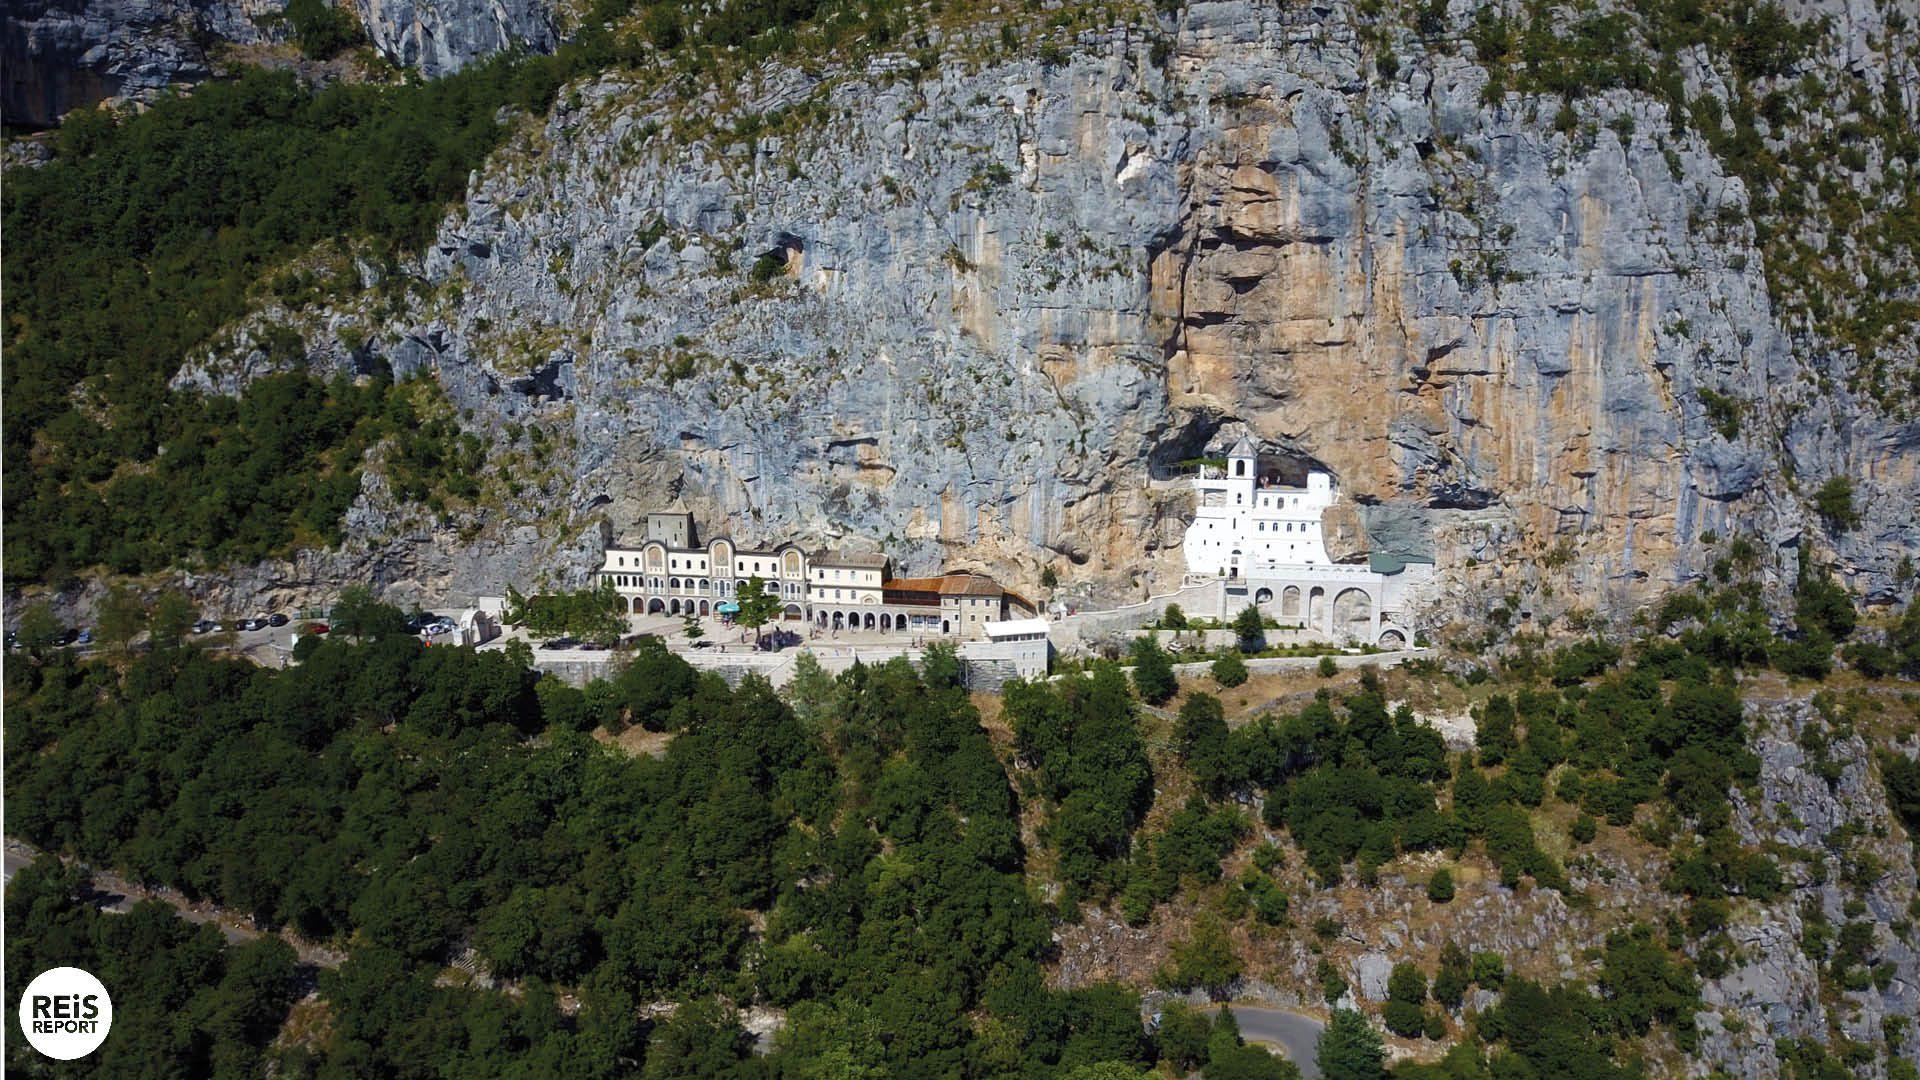 manastir ostrog klooster montenegro